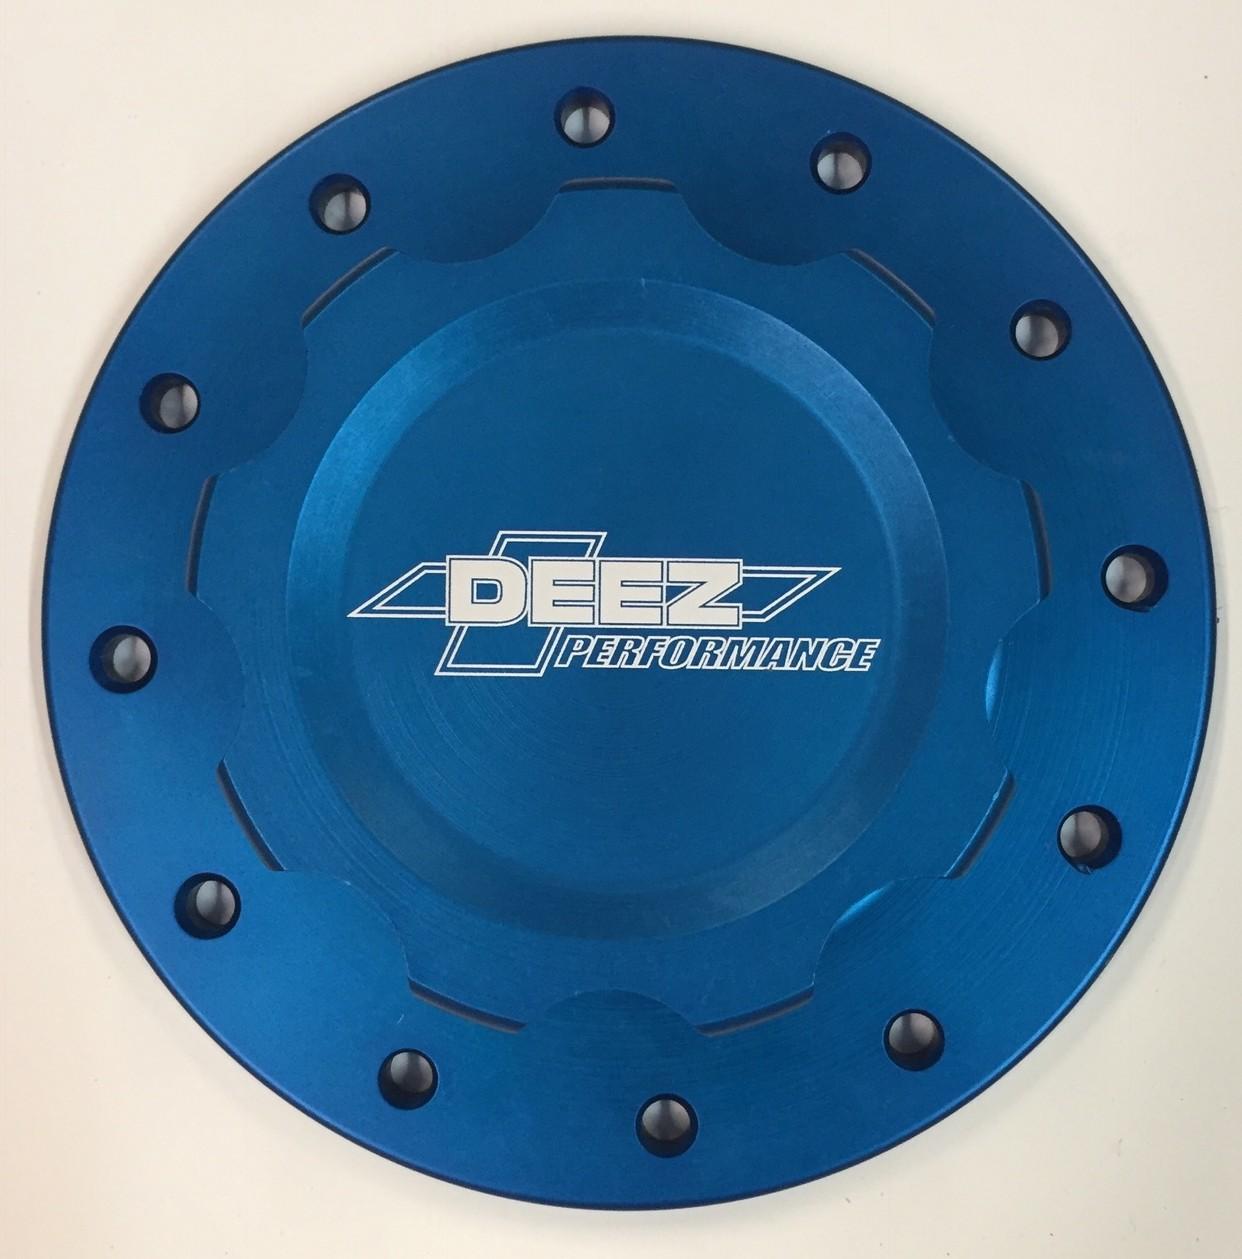 DEEZ Performance 12-Bolt Billet Aluminum Fuel Cell Cap & Bung Assembly-Blue